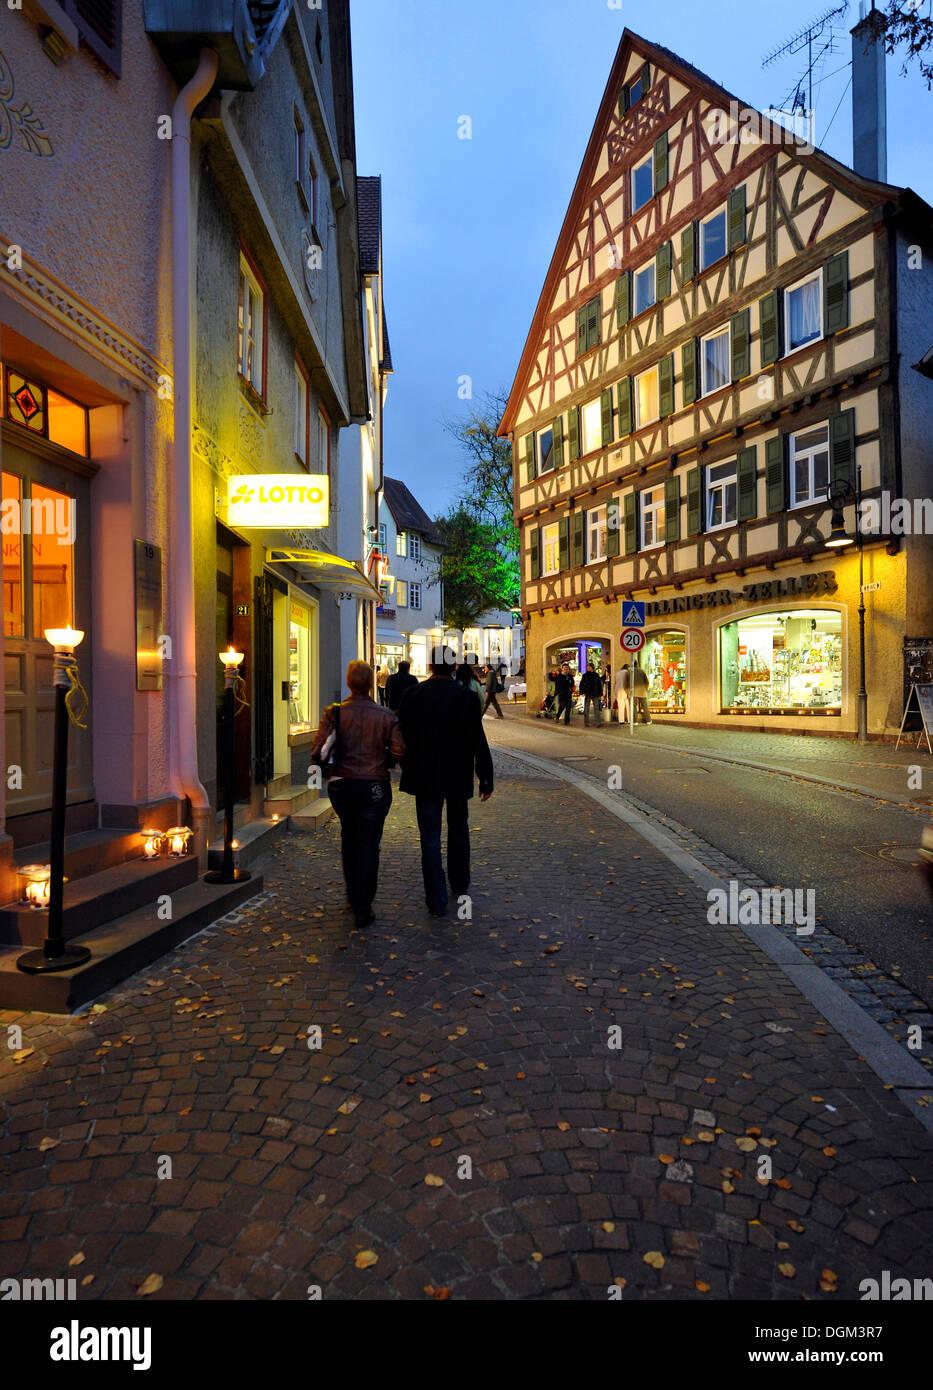 Waiblingen Leuchtet, Beleuchtung, Altstadt, Fachwerk Häuser, Marktplatz, Waiblingen, Rems-Murr-Kreis-Bezirk Stockbild